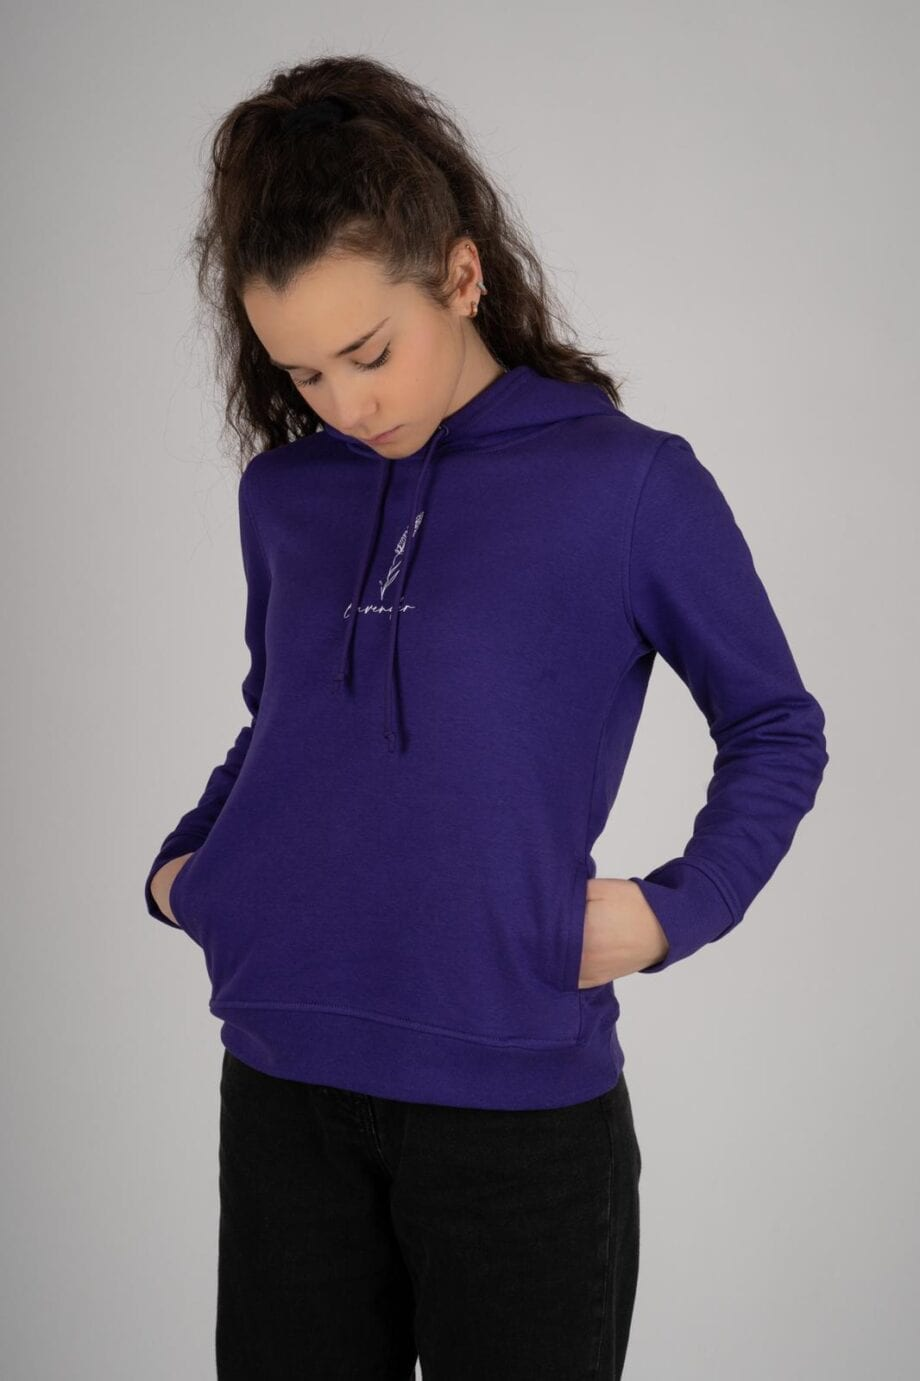 Shop Online Felpa viola lavender I AM ME